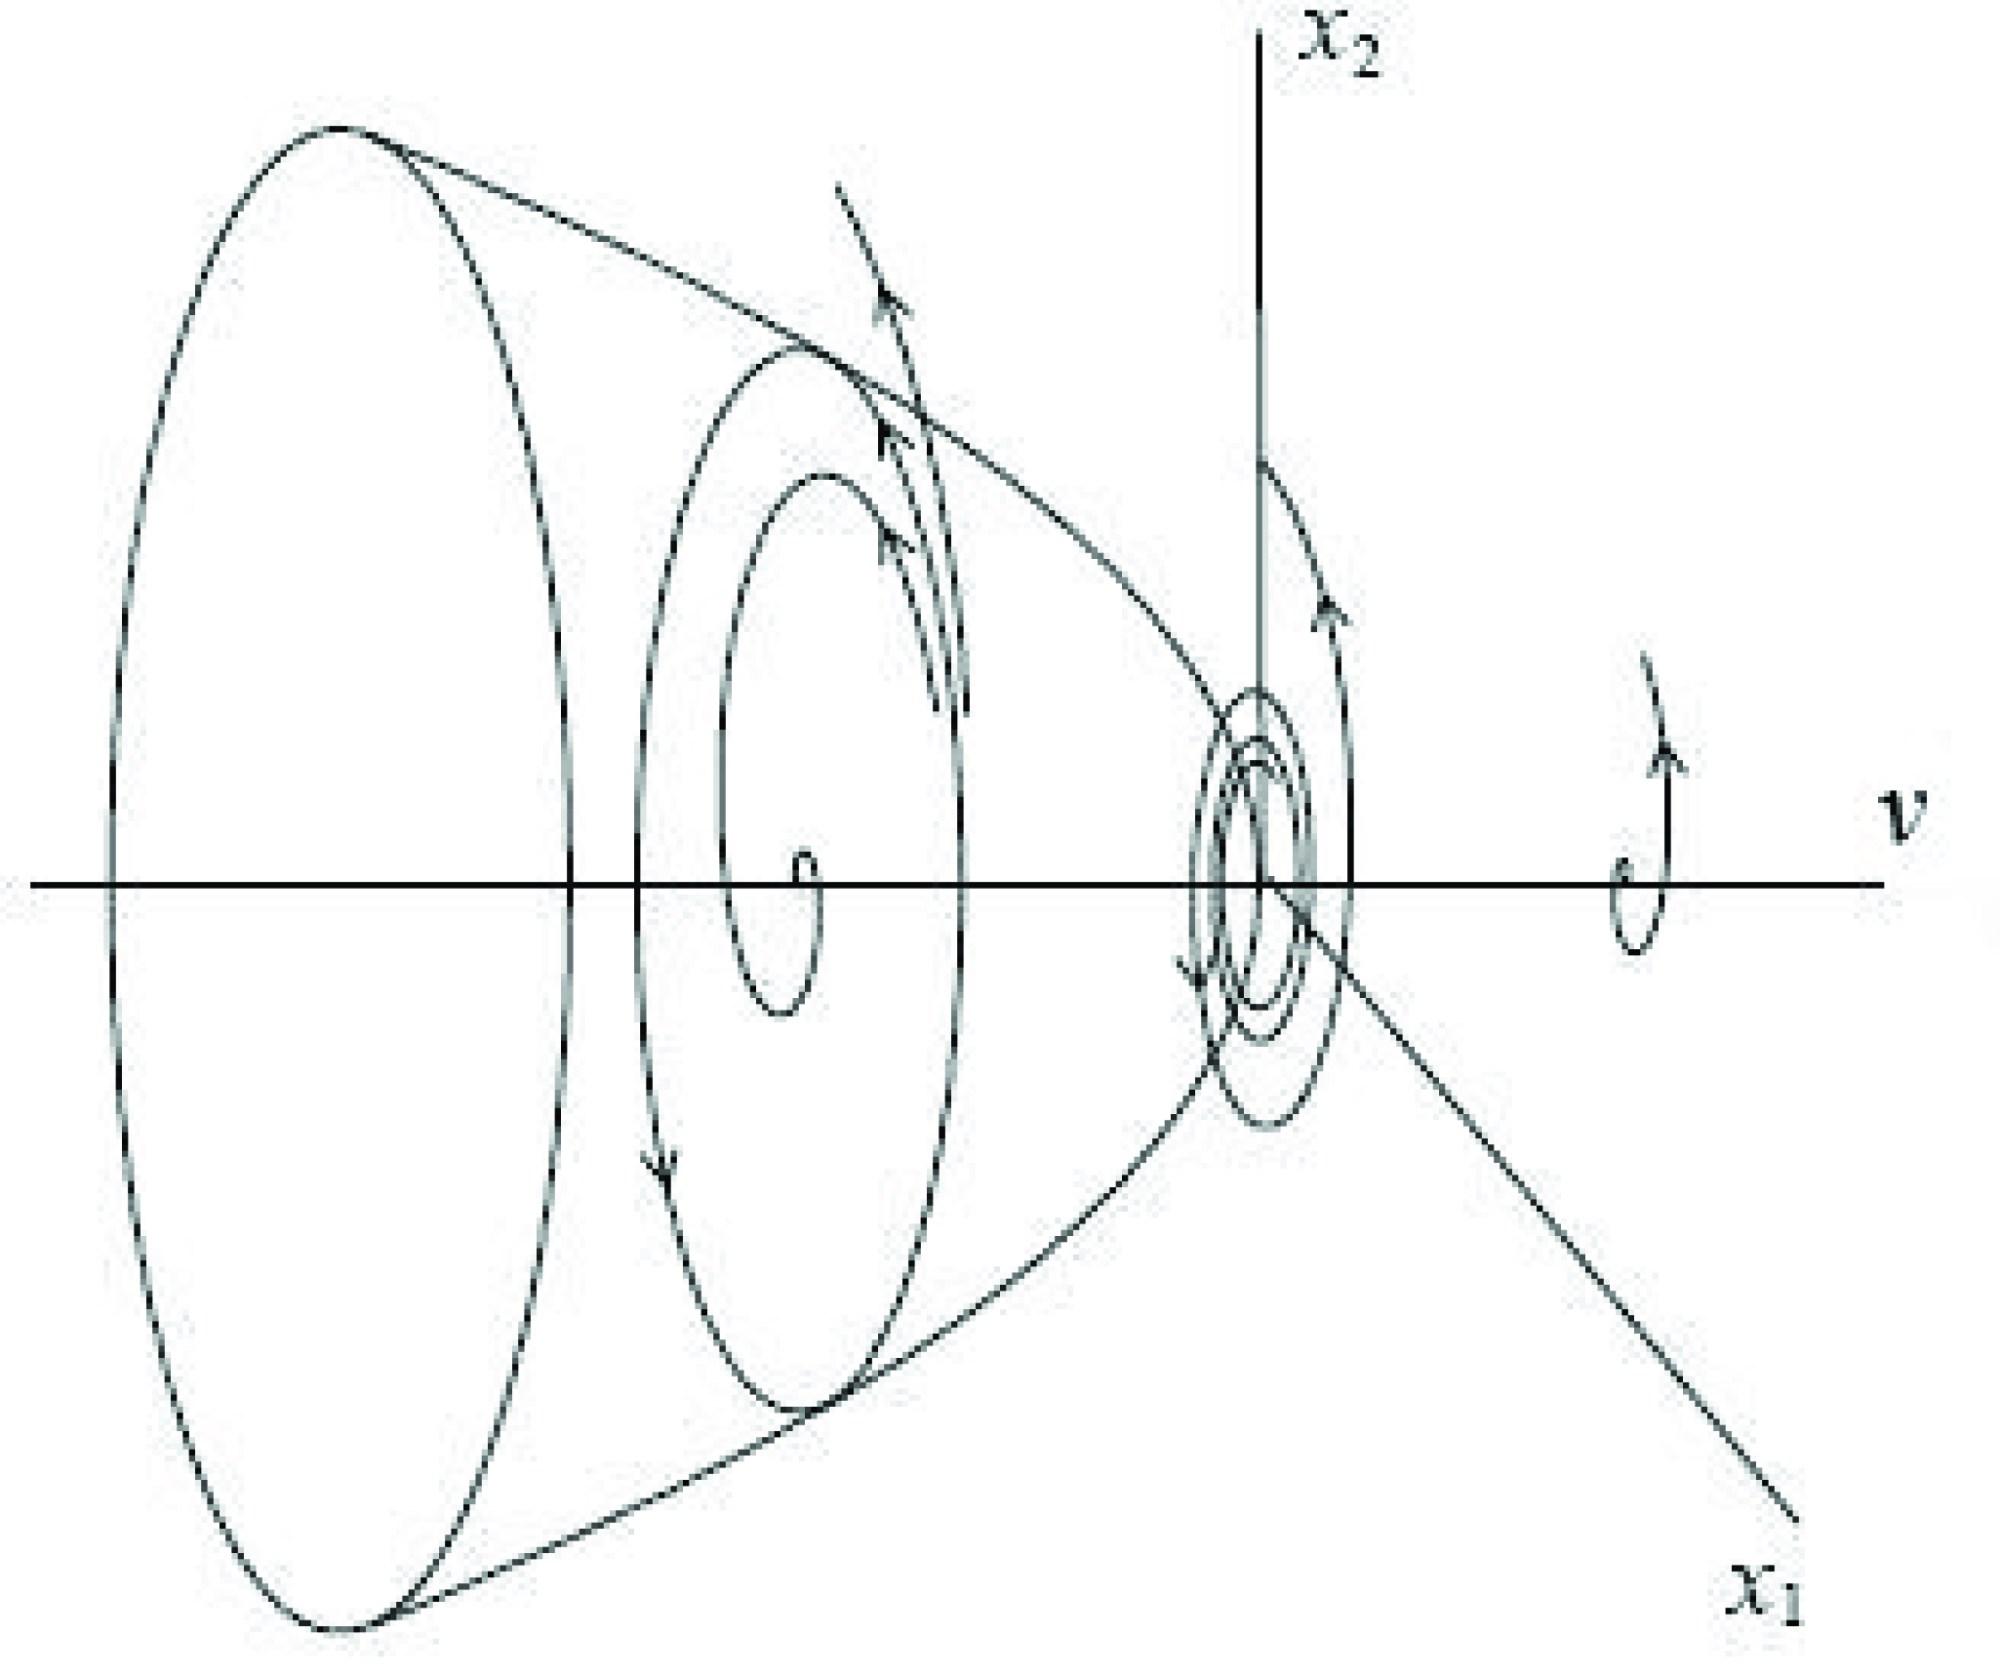 hight resolution of figure 8 subcritical hopf bifurcation